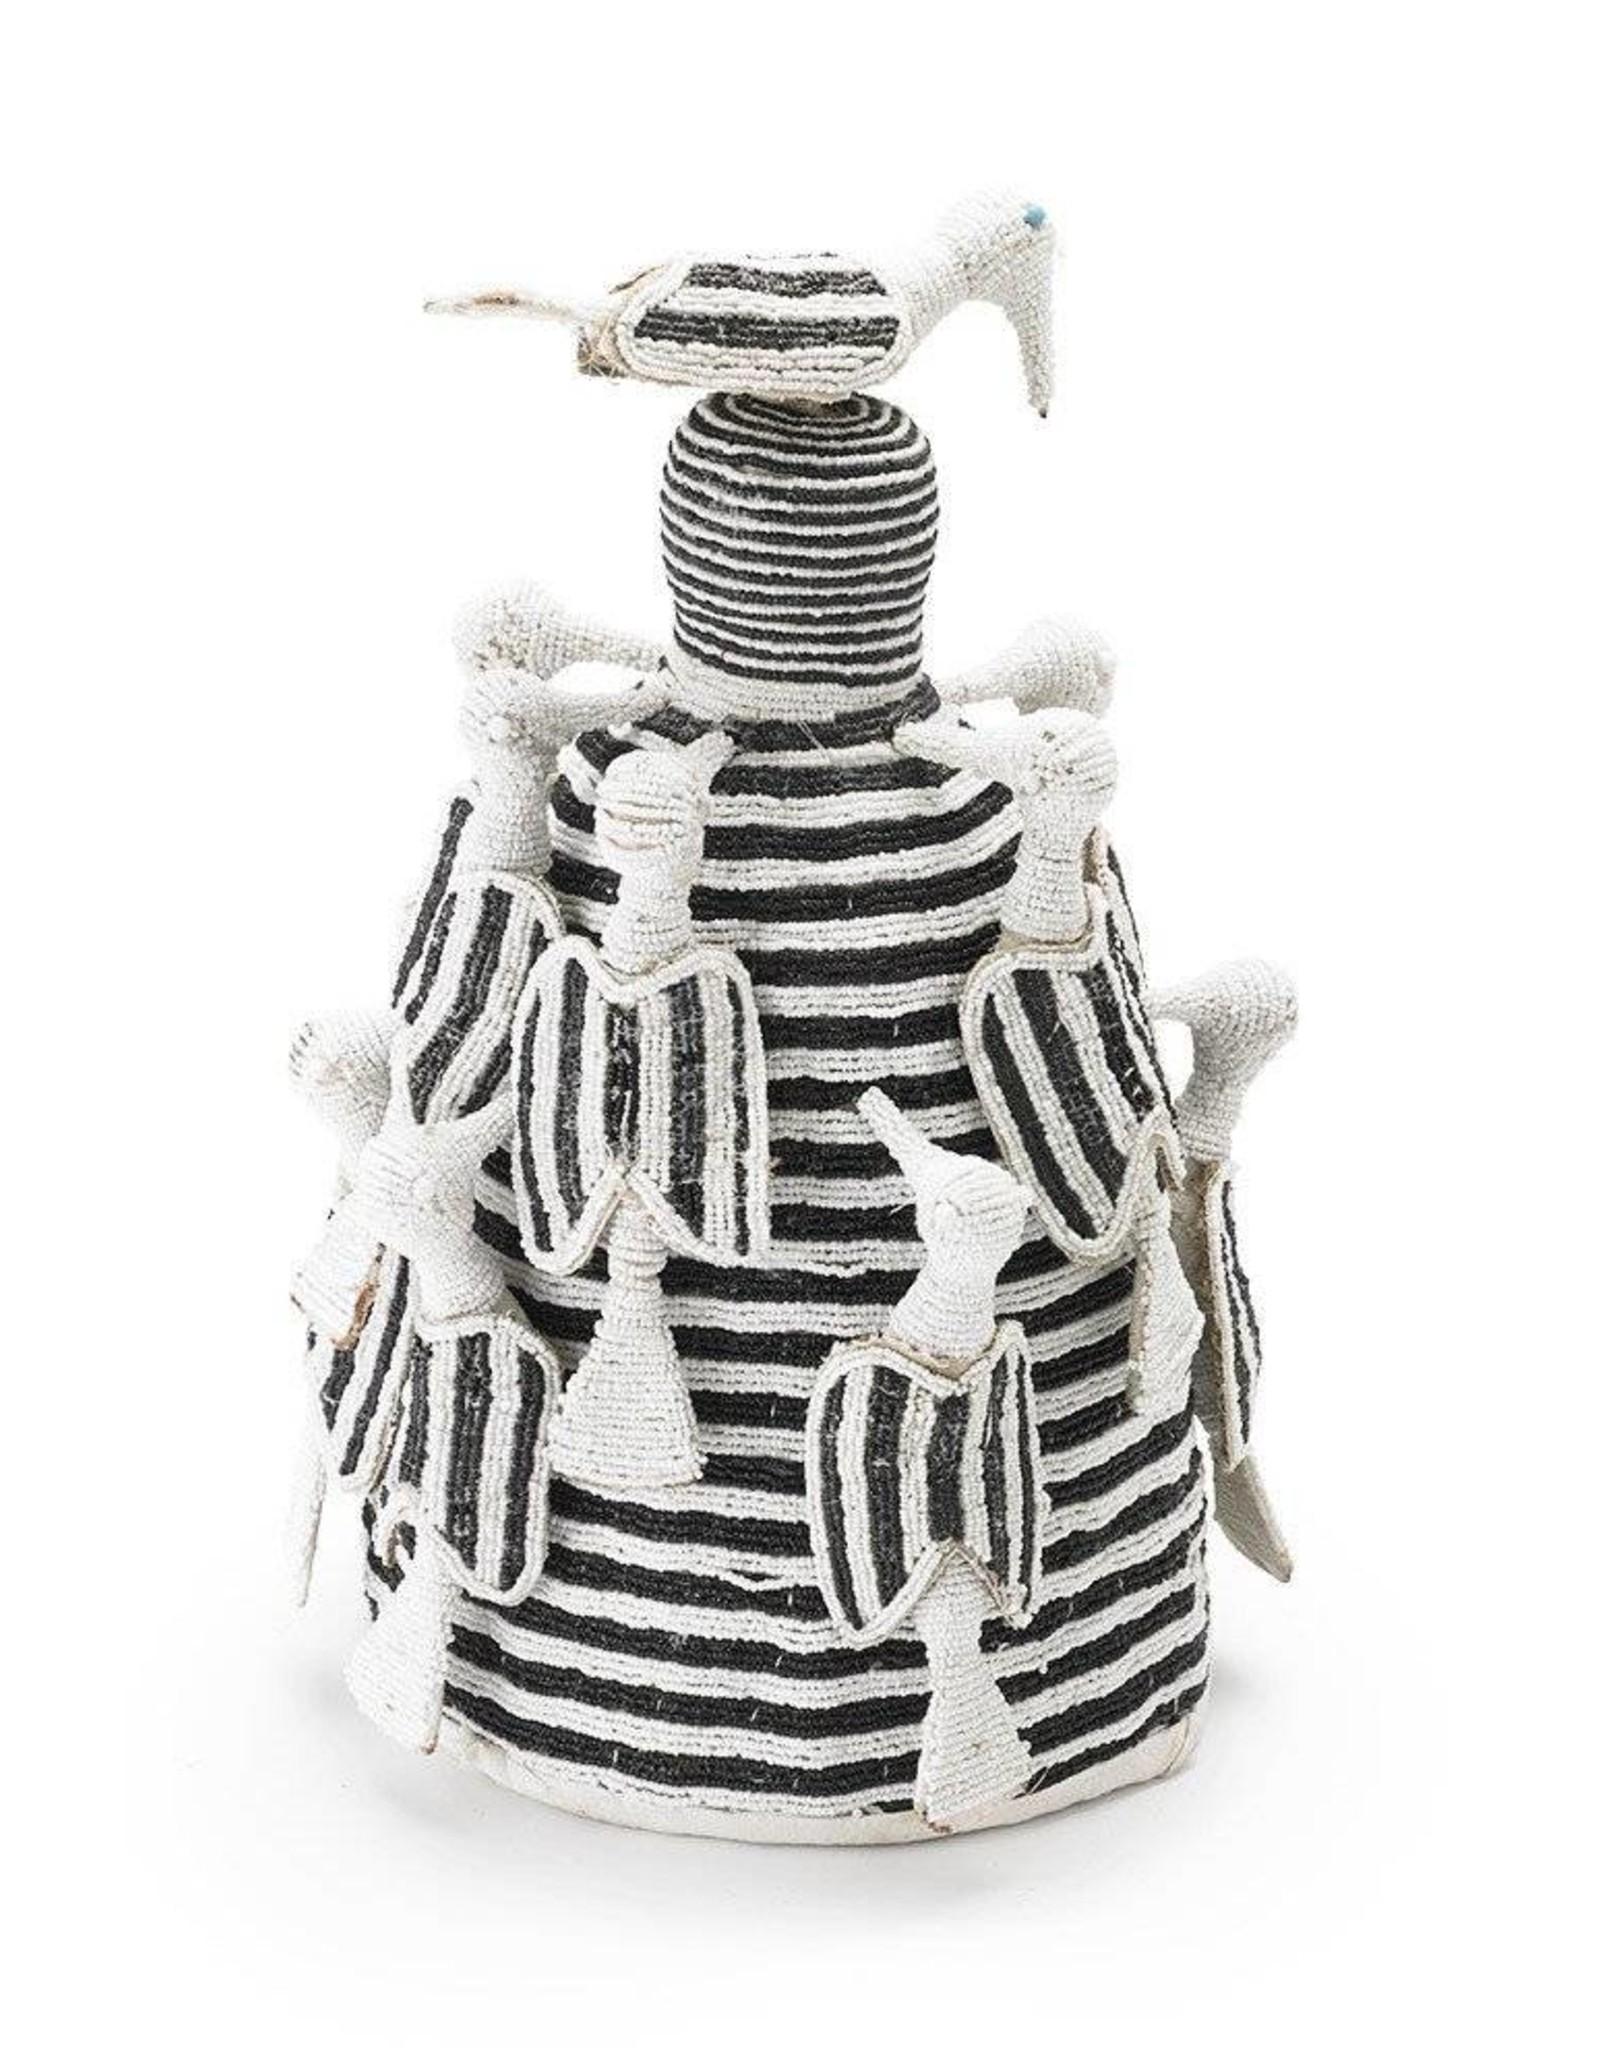 Kiondo White and Black Yoruba Crown on Stand - Small